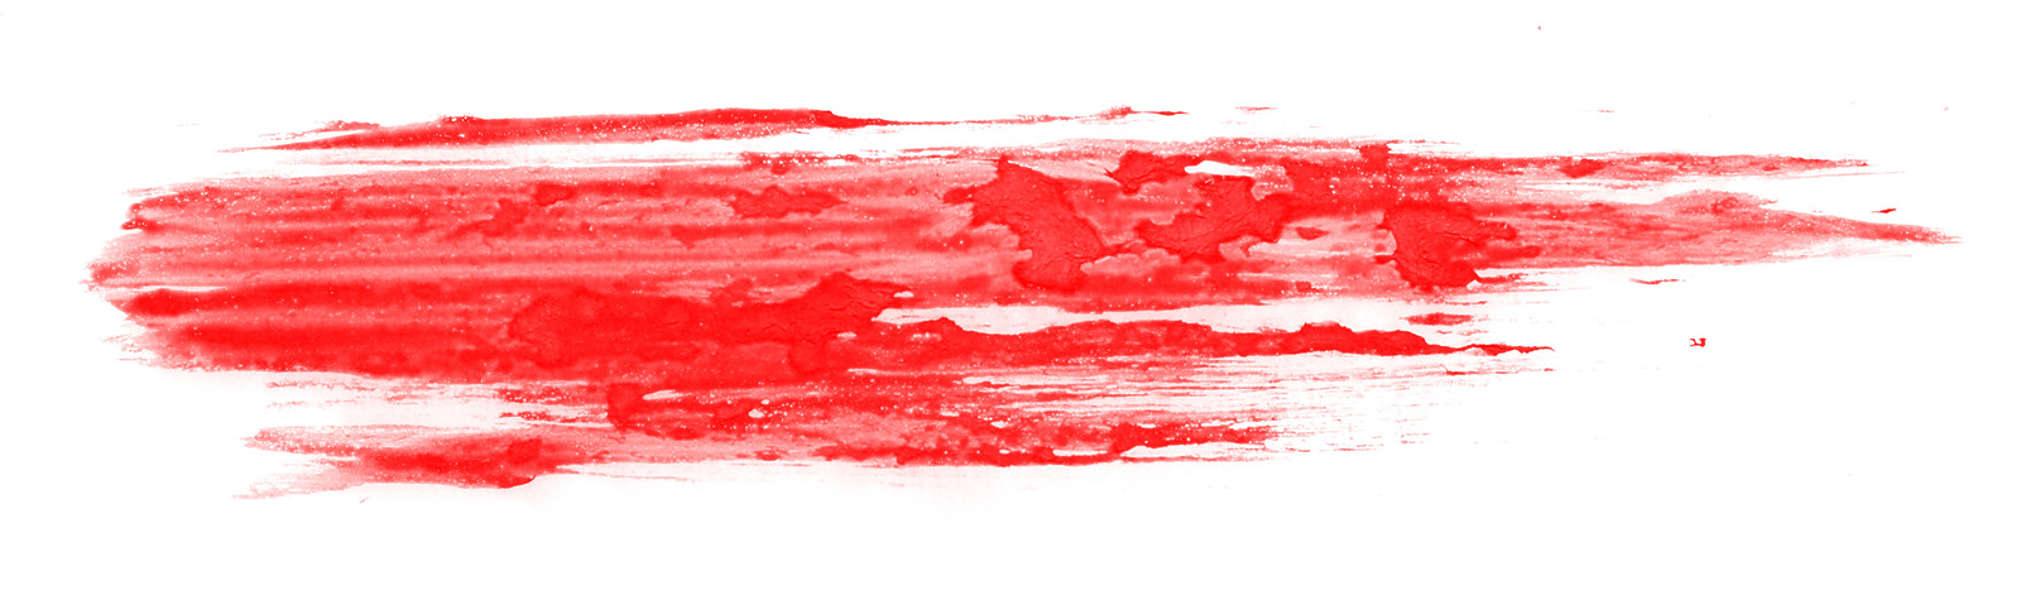 Splattersmearhorz0126 Free Background Texture Smear